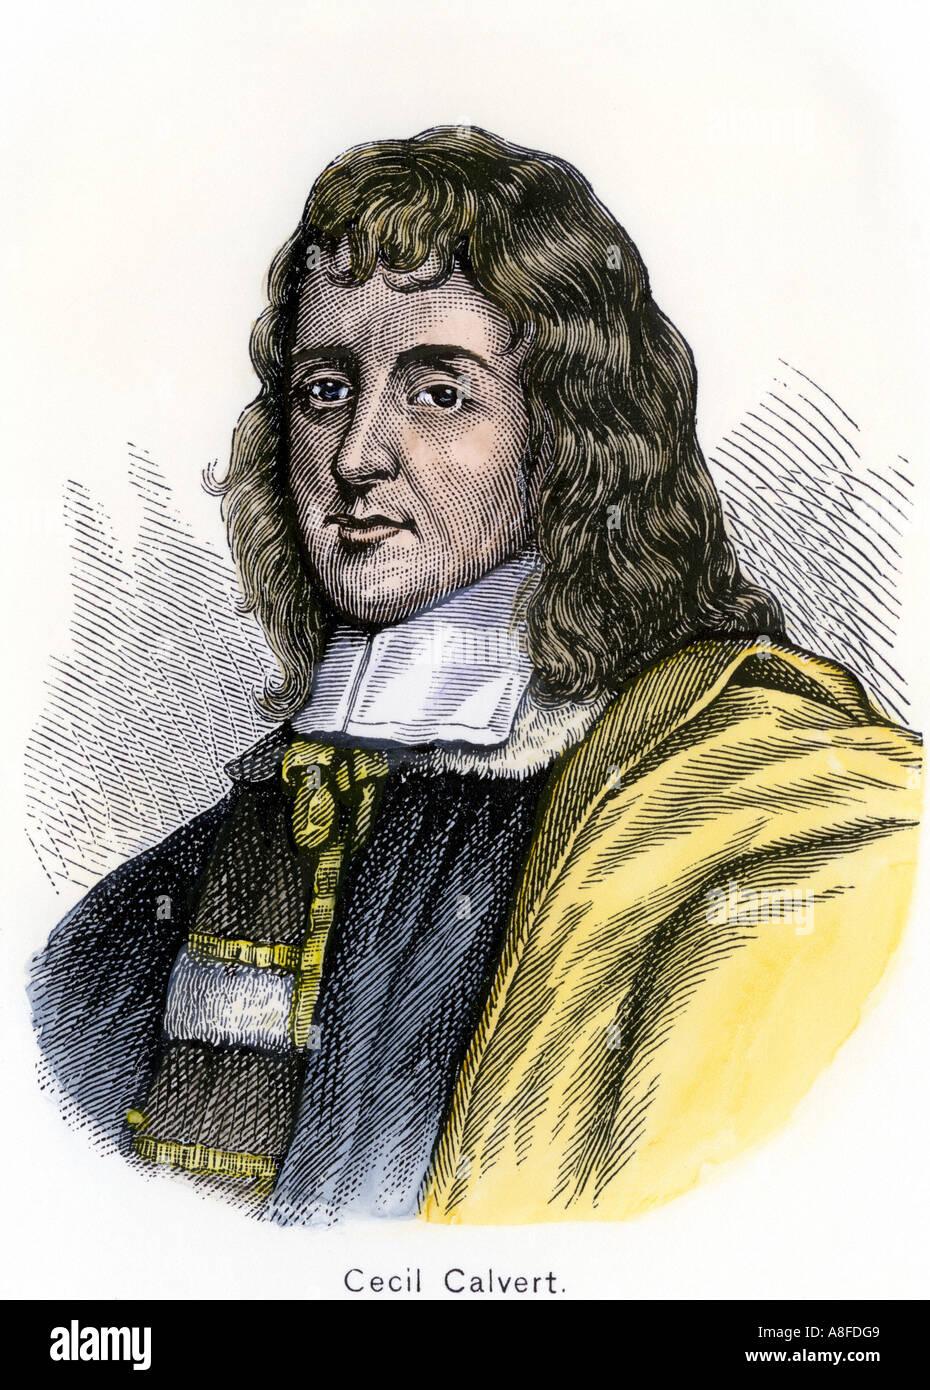 Cecil Calvert Second Baron Baltimore. Hand-colored woodcut - Stock Image